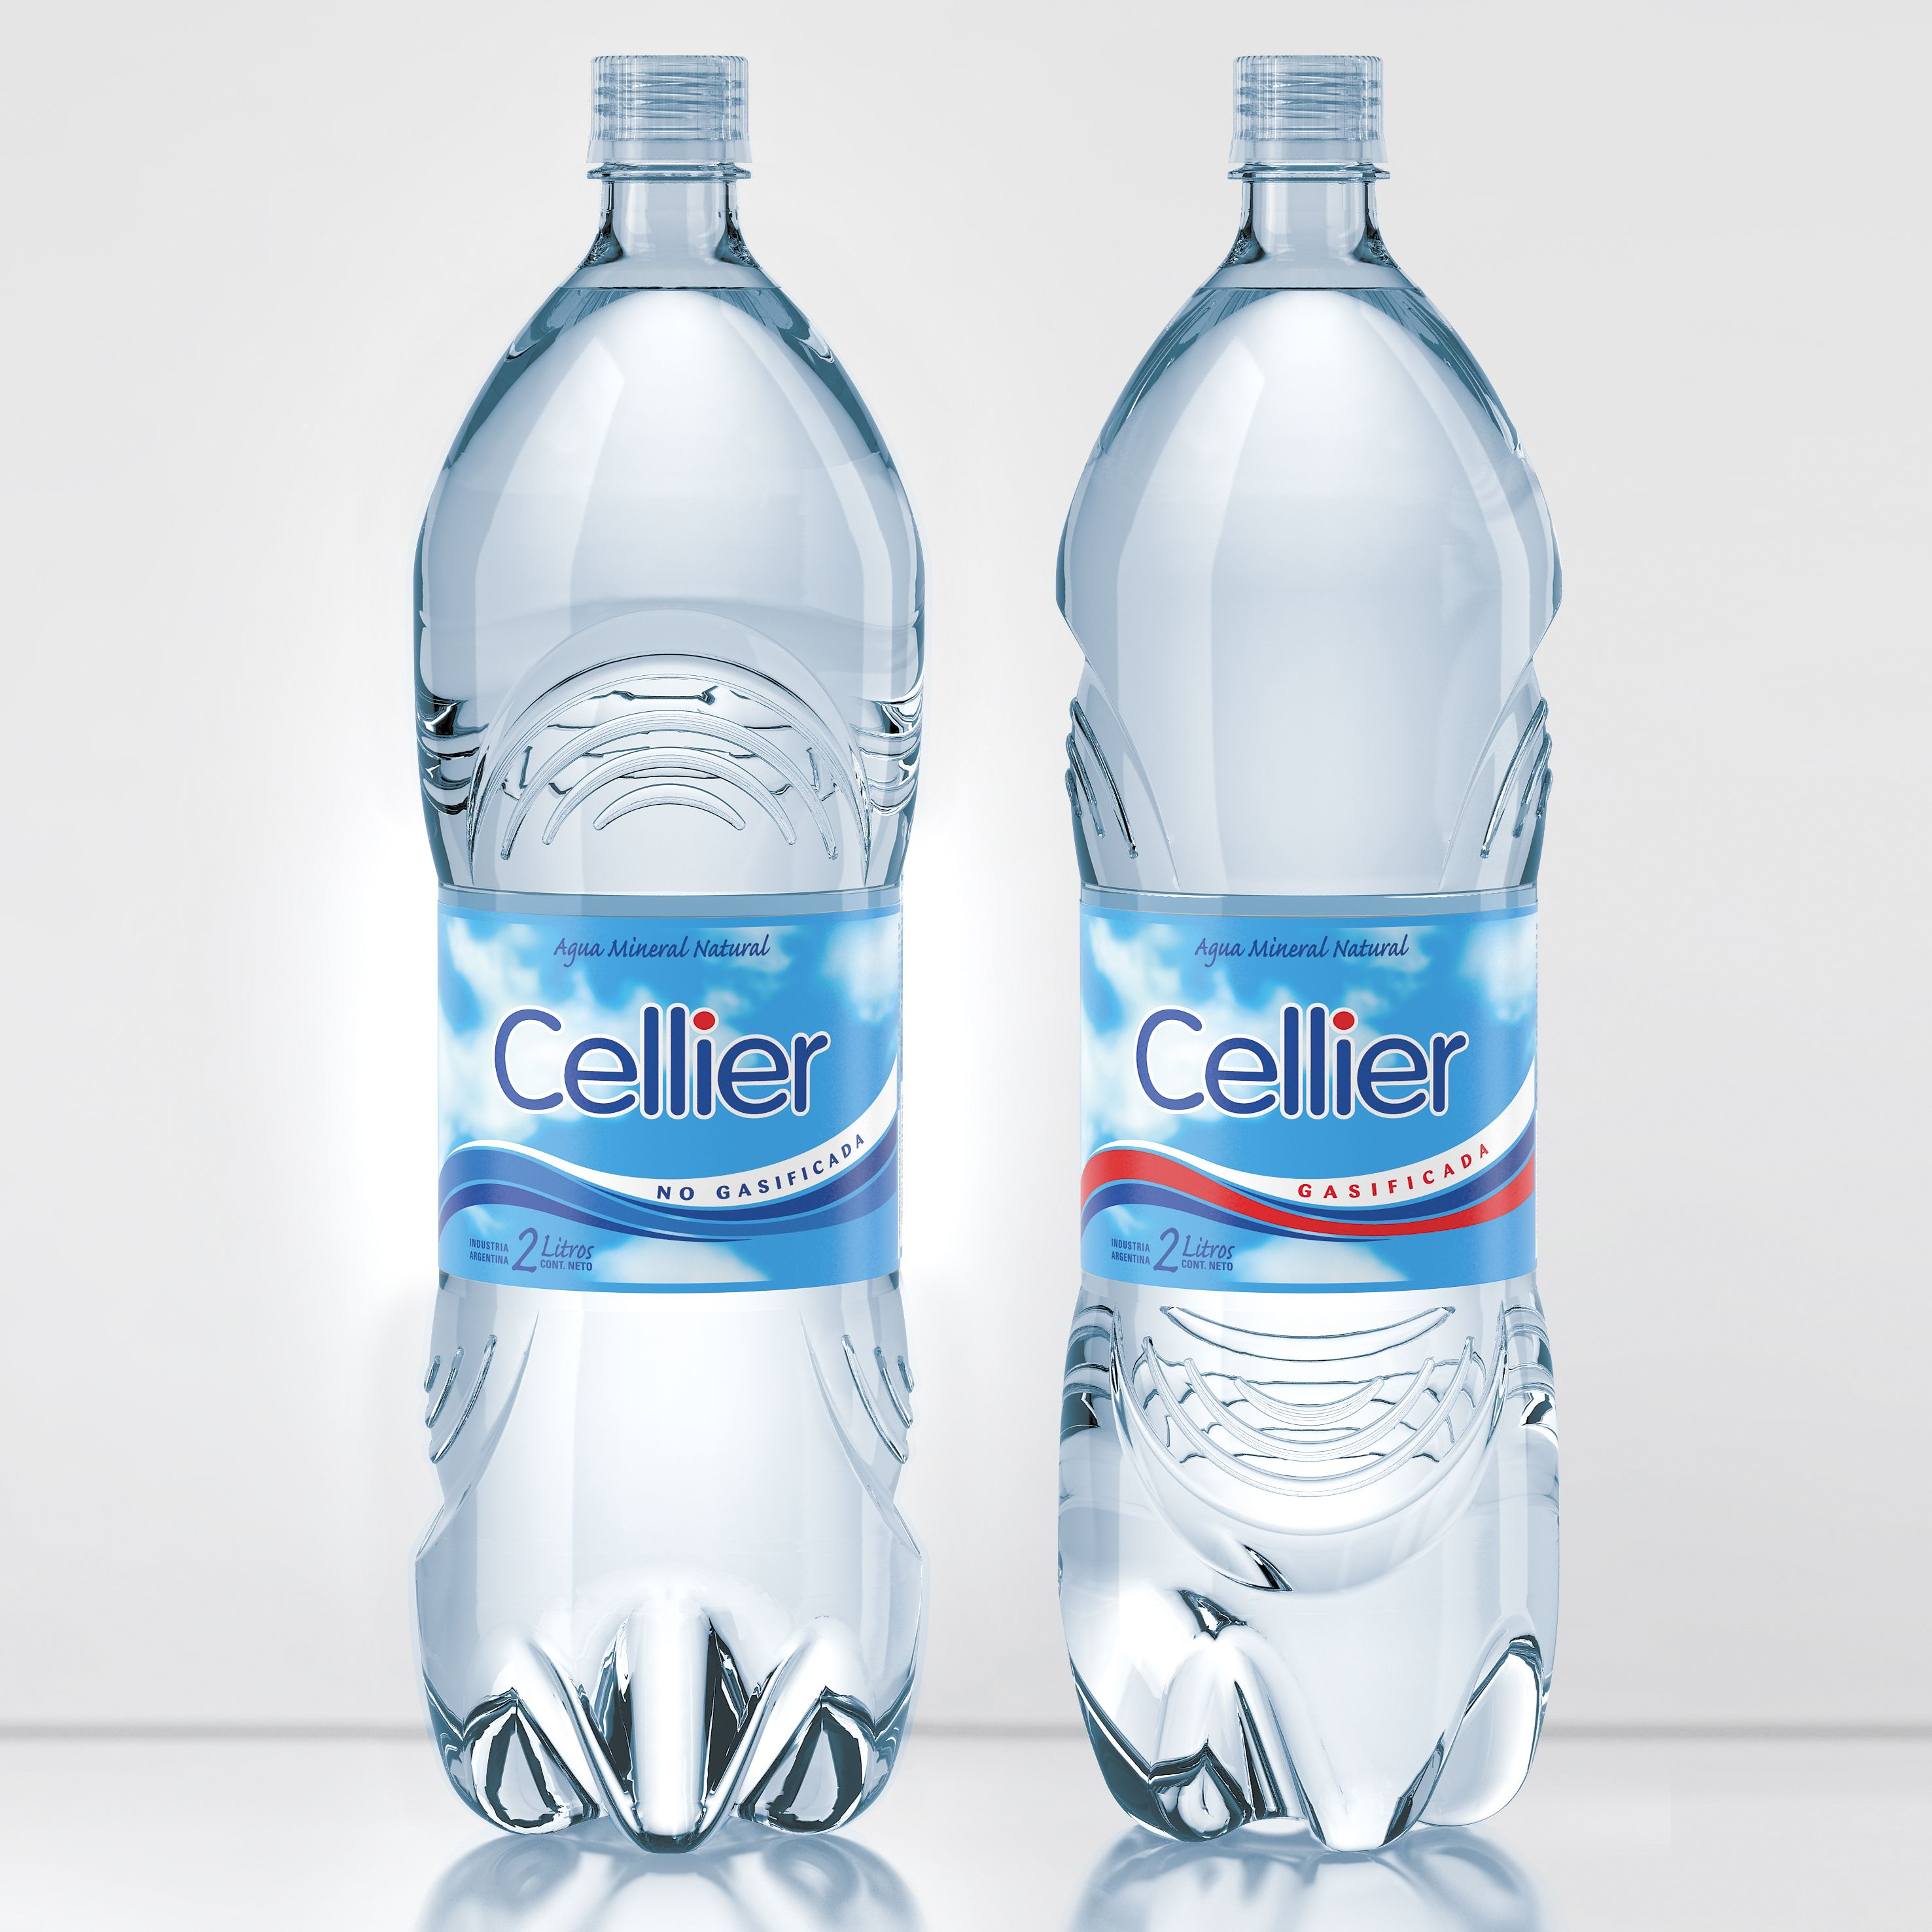 Cellier water aqua pinterest water bottle design for Decor drink bottle